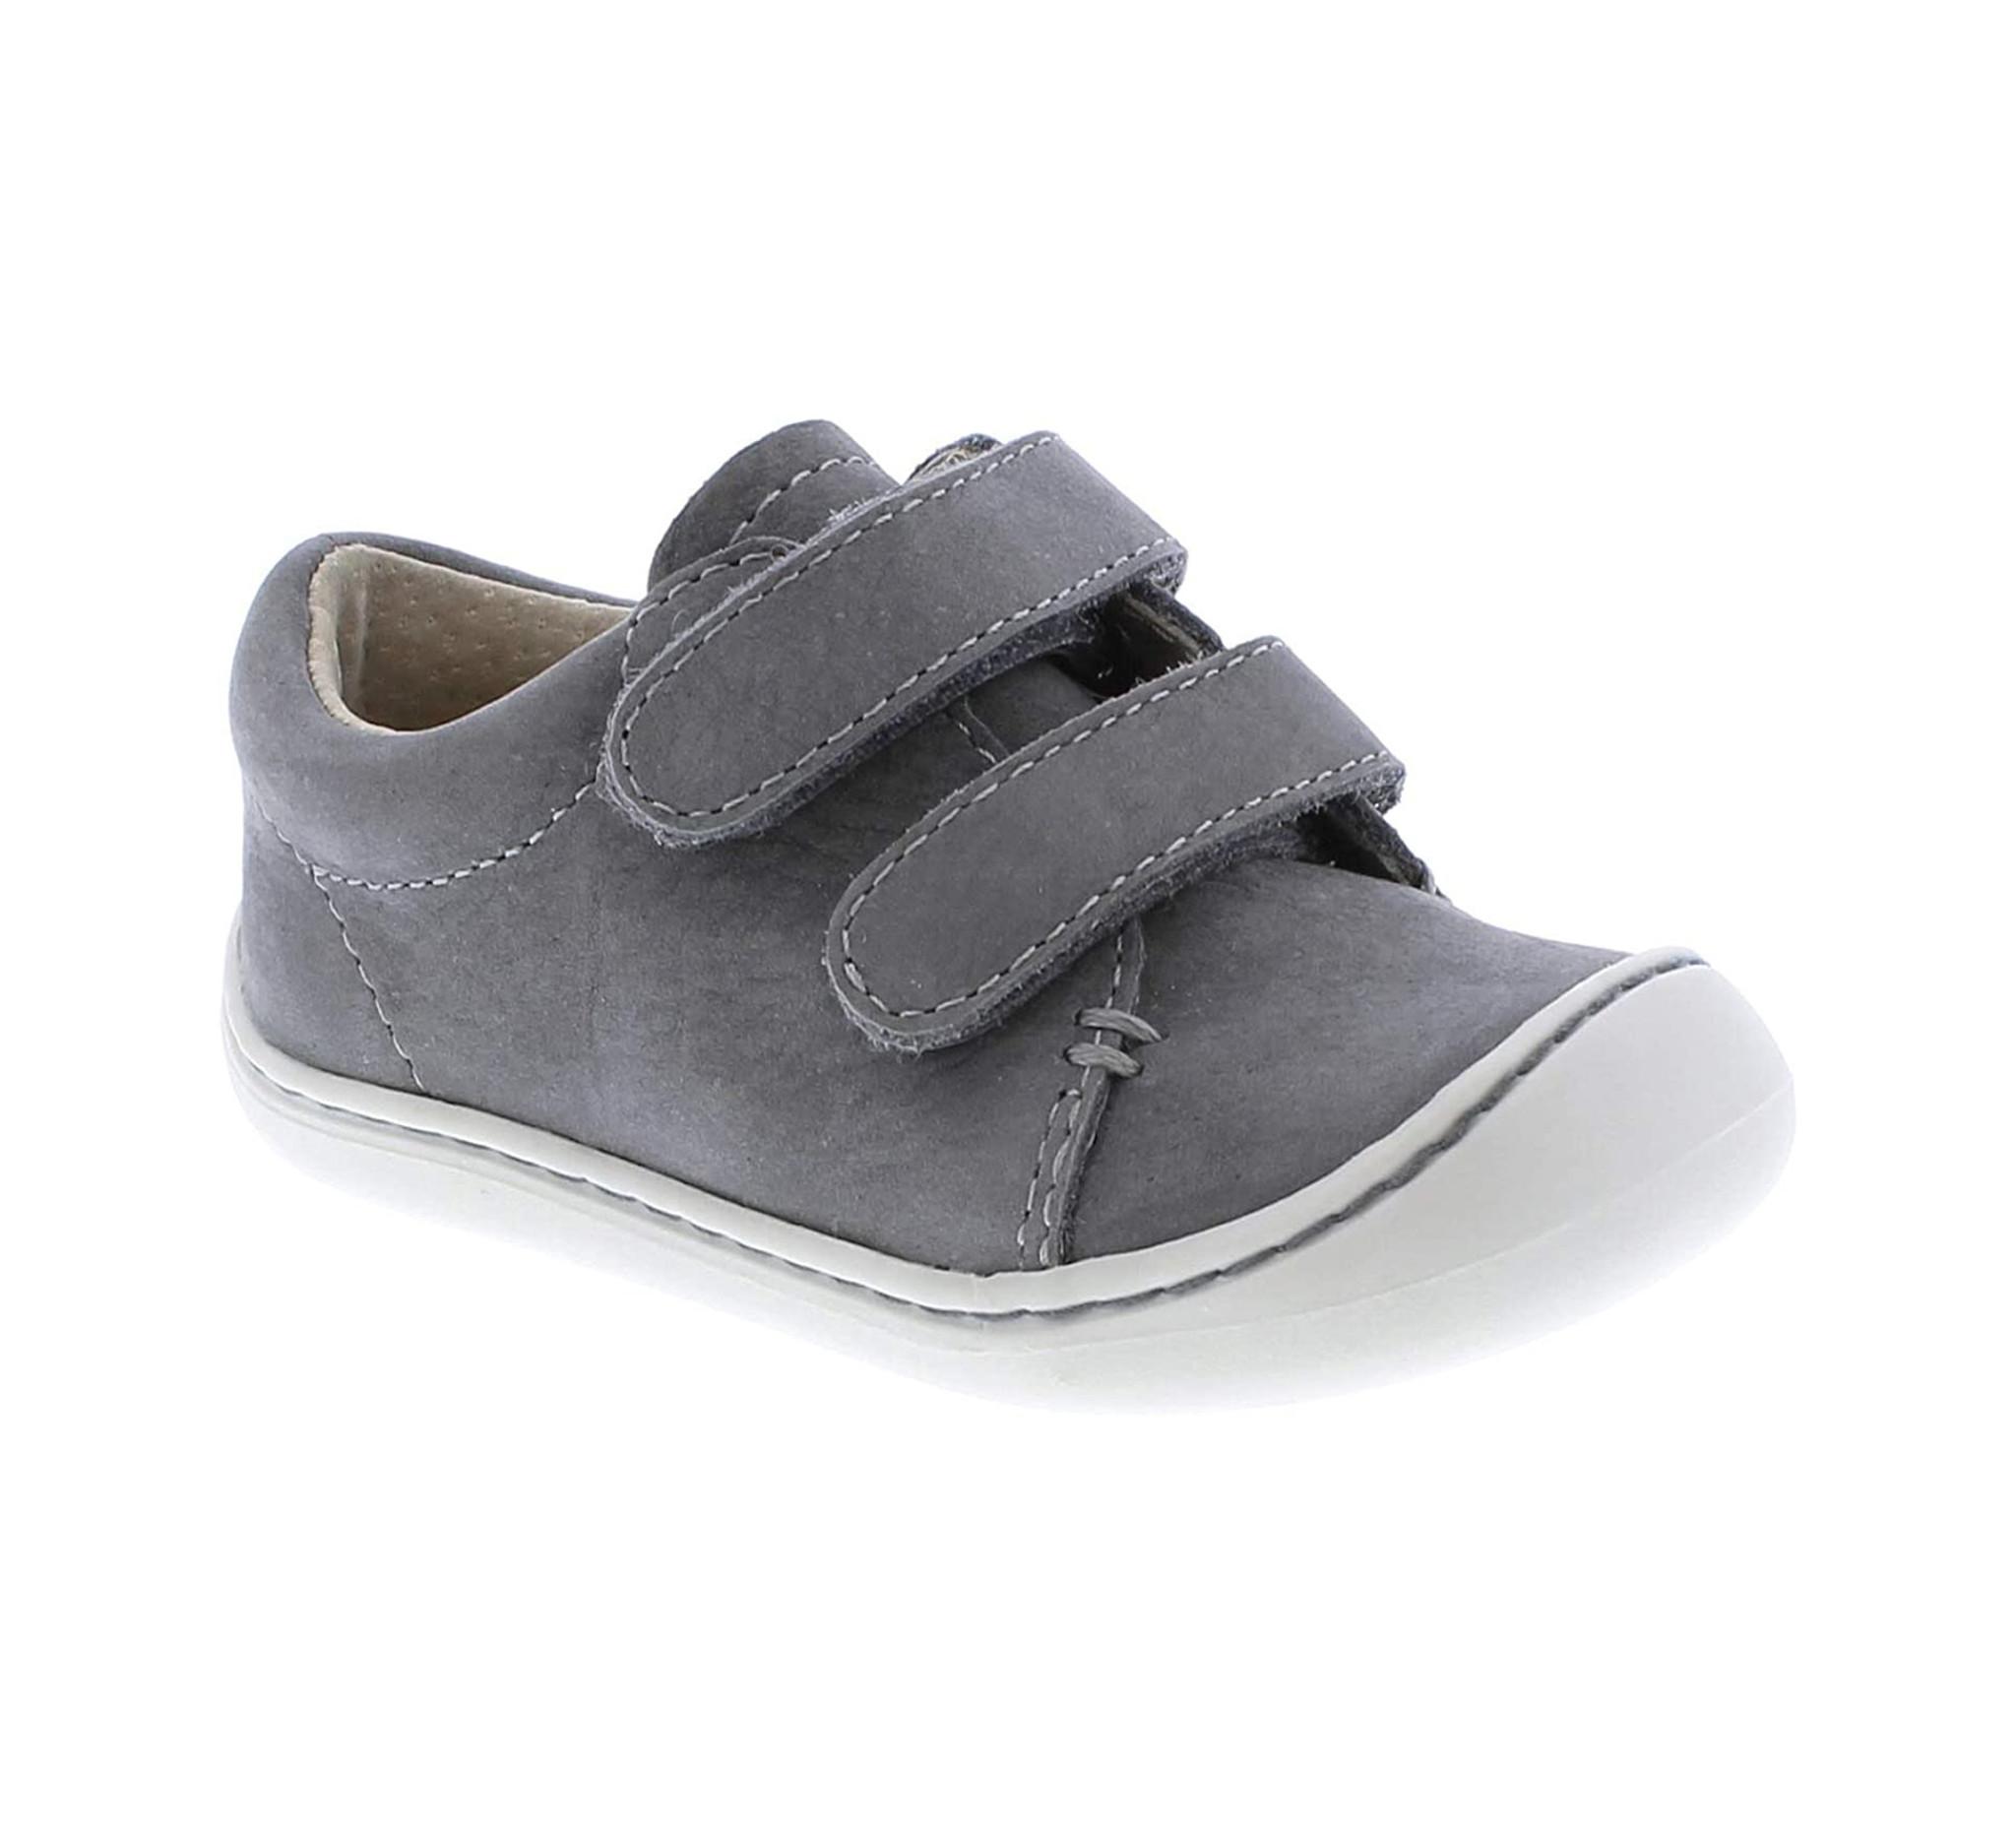 Footmates Henry Gray Shoe